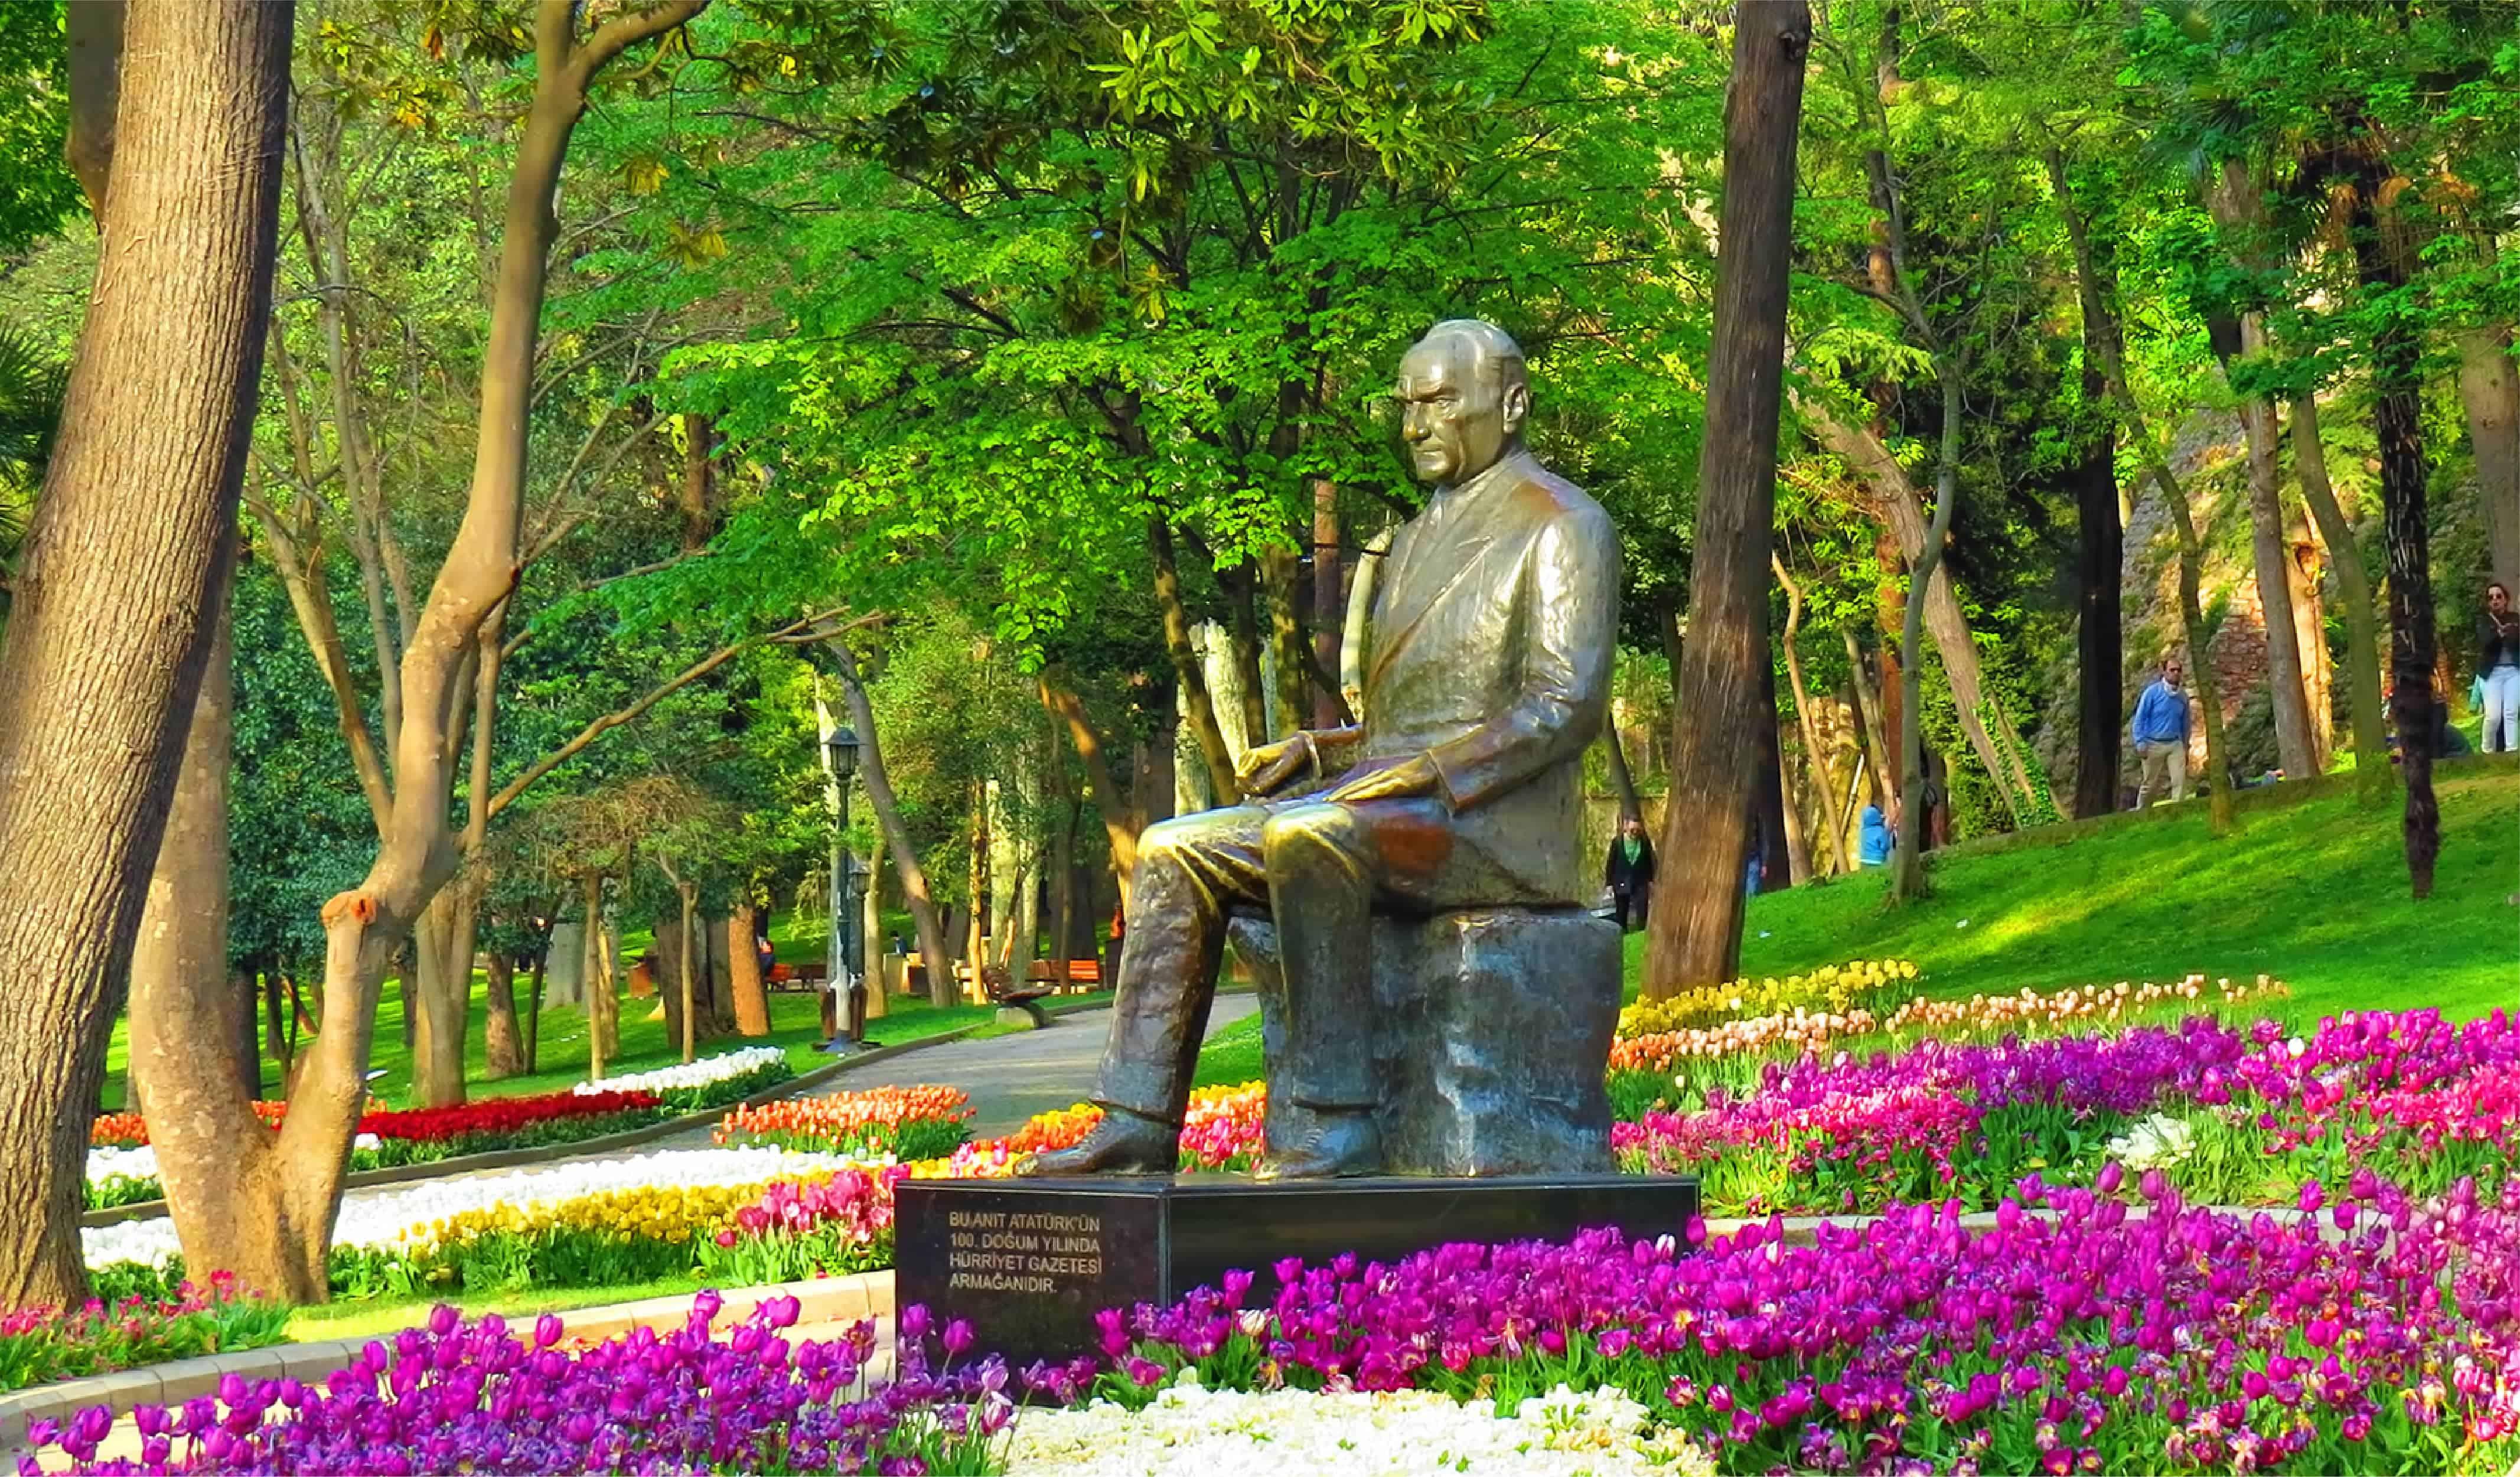 Ataturk statue in Gulhane Park